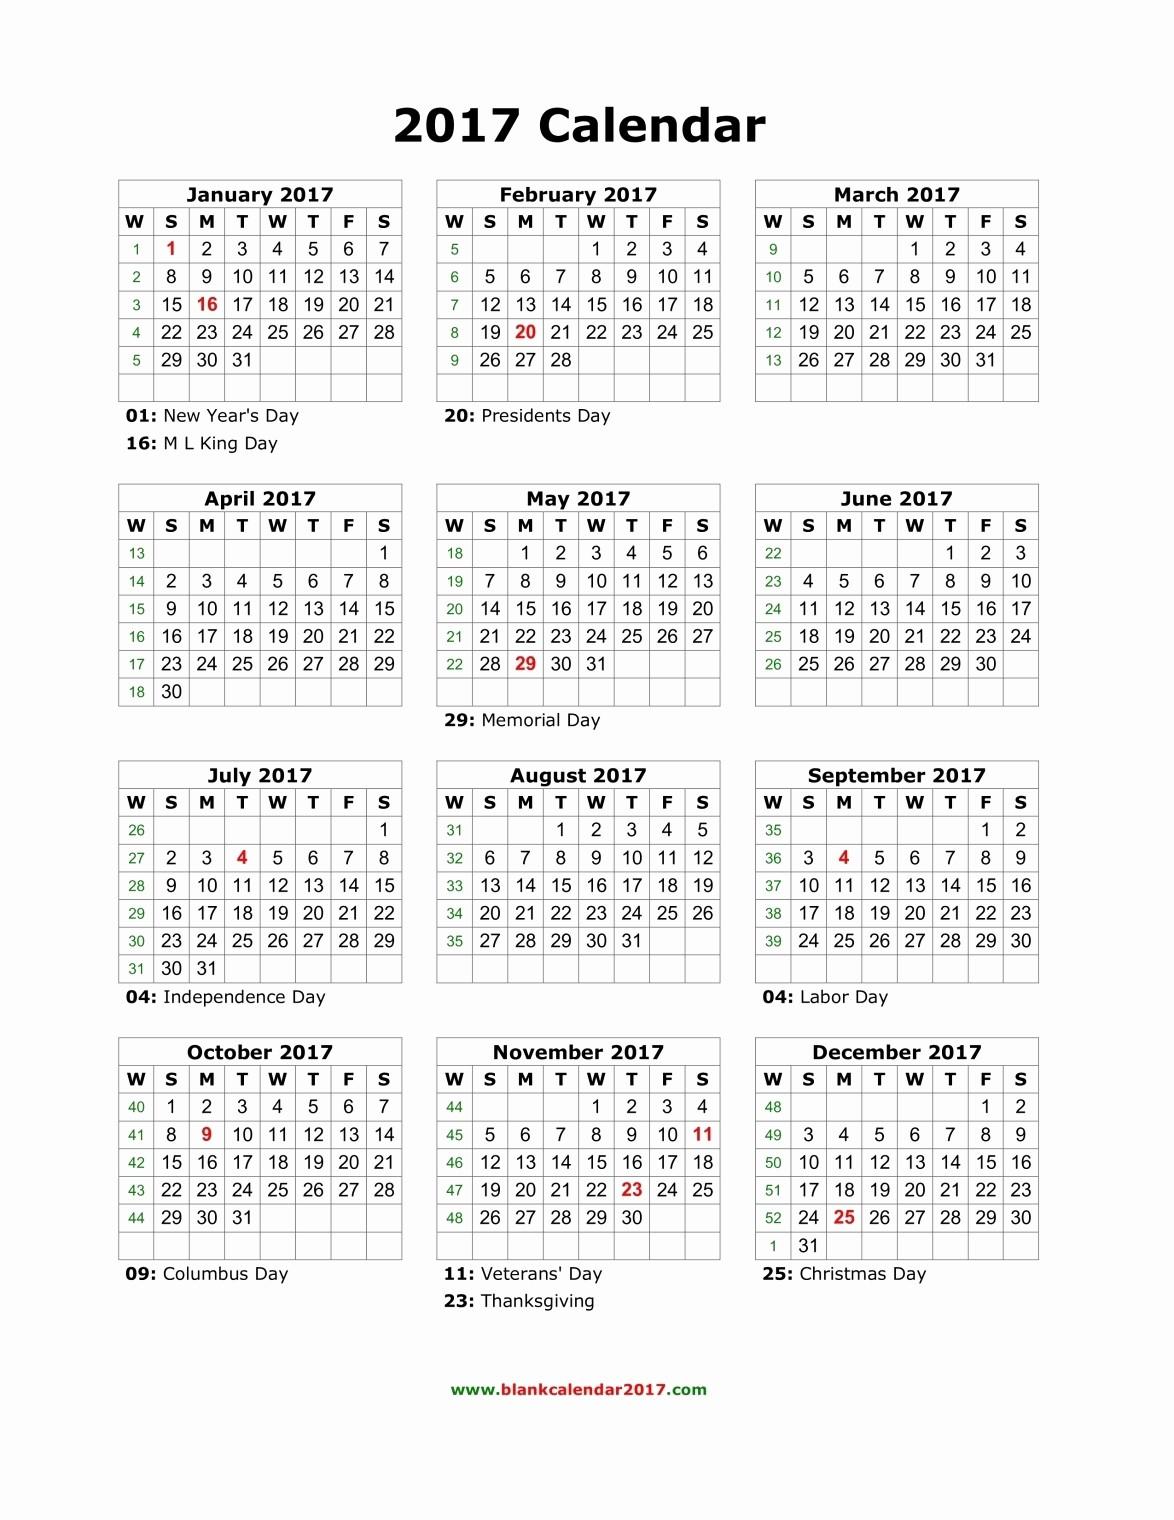 2017 Full Year Printable Calendar Inspirational Blank Calendar 2017